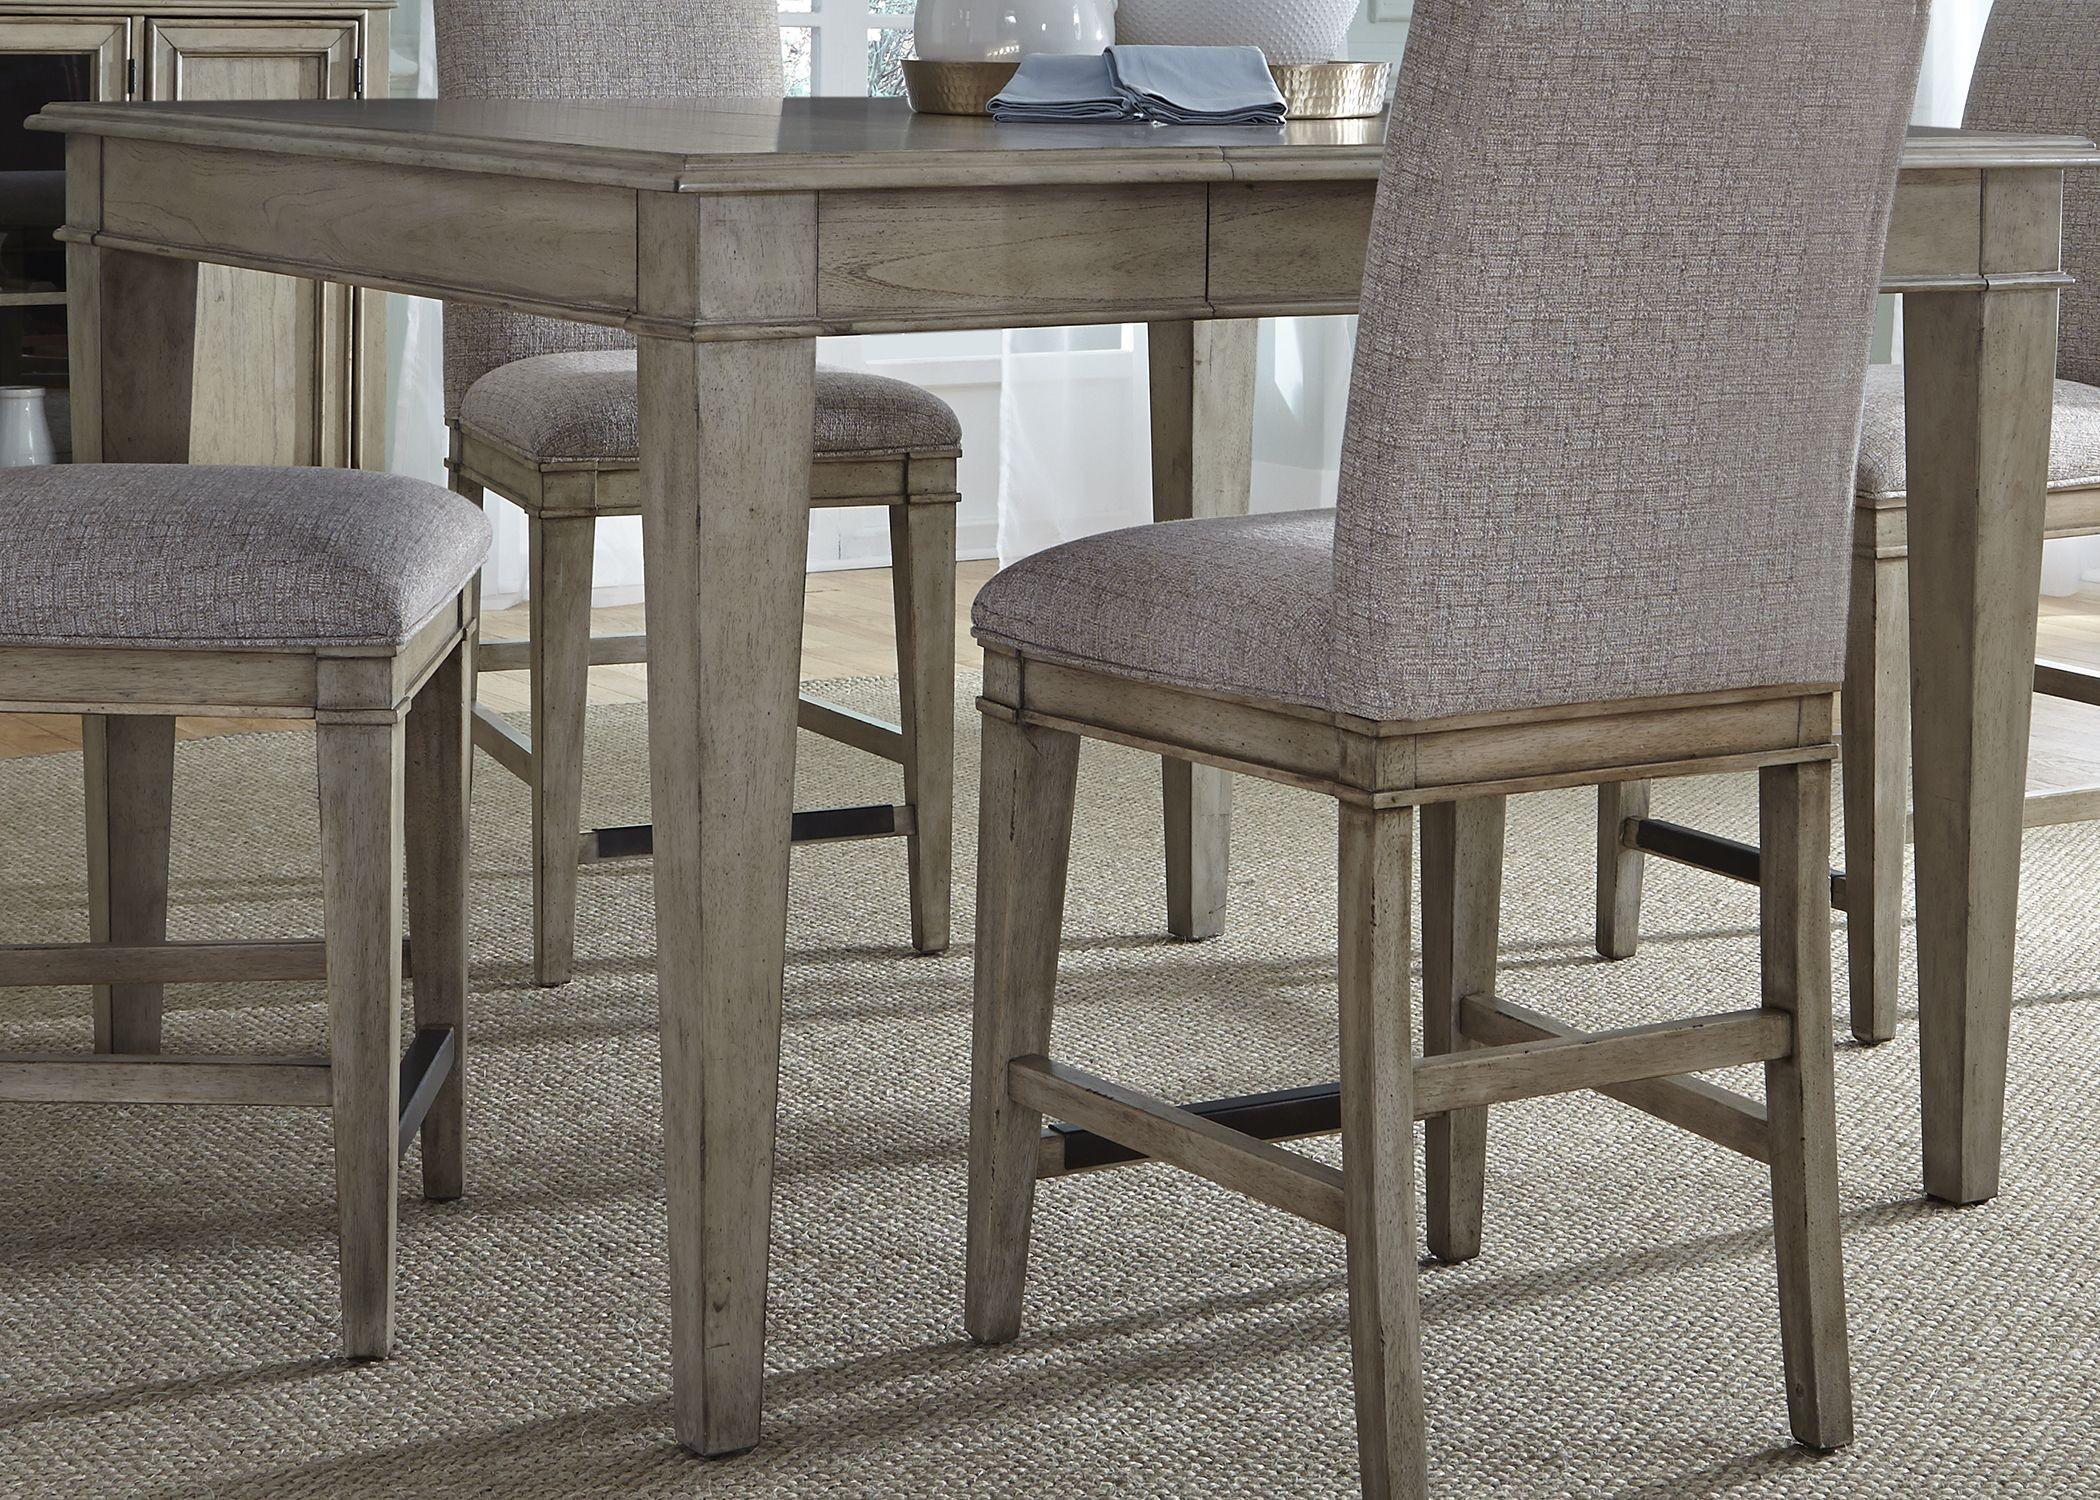 Grayton grove driftwood extendable counter height dining for Counter height extendable dining table